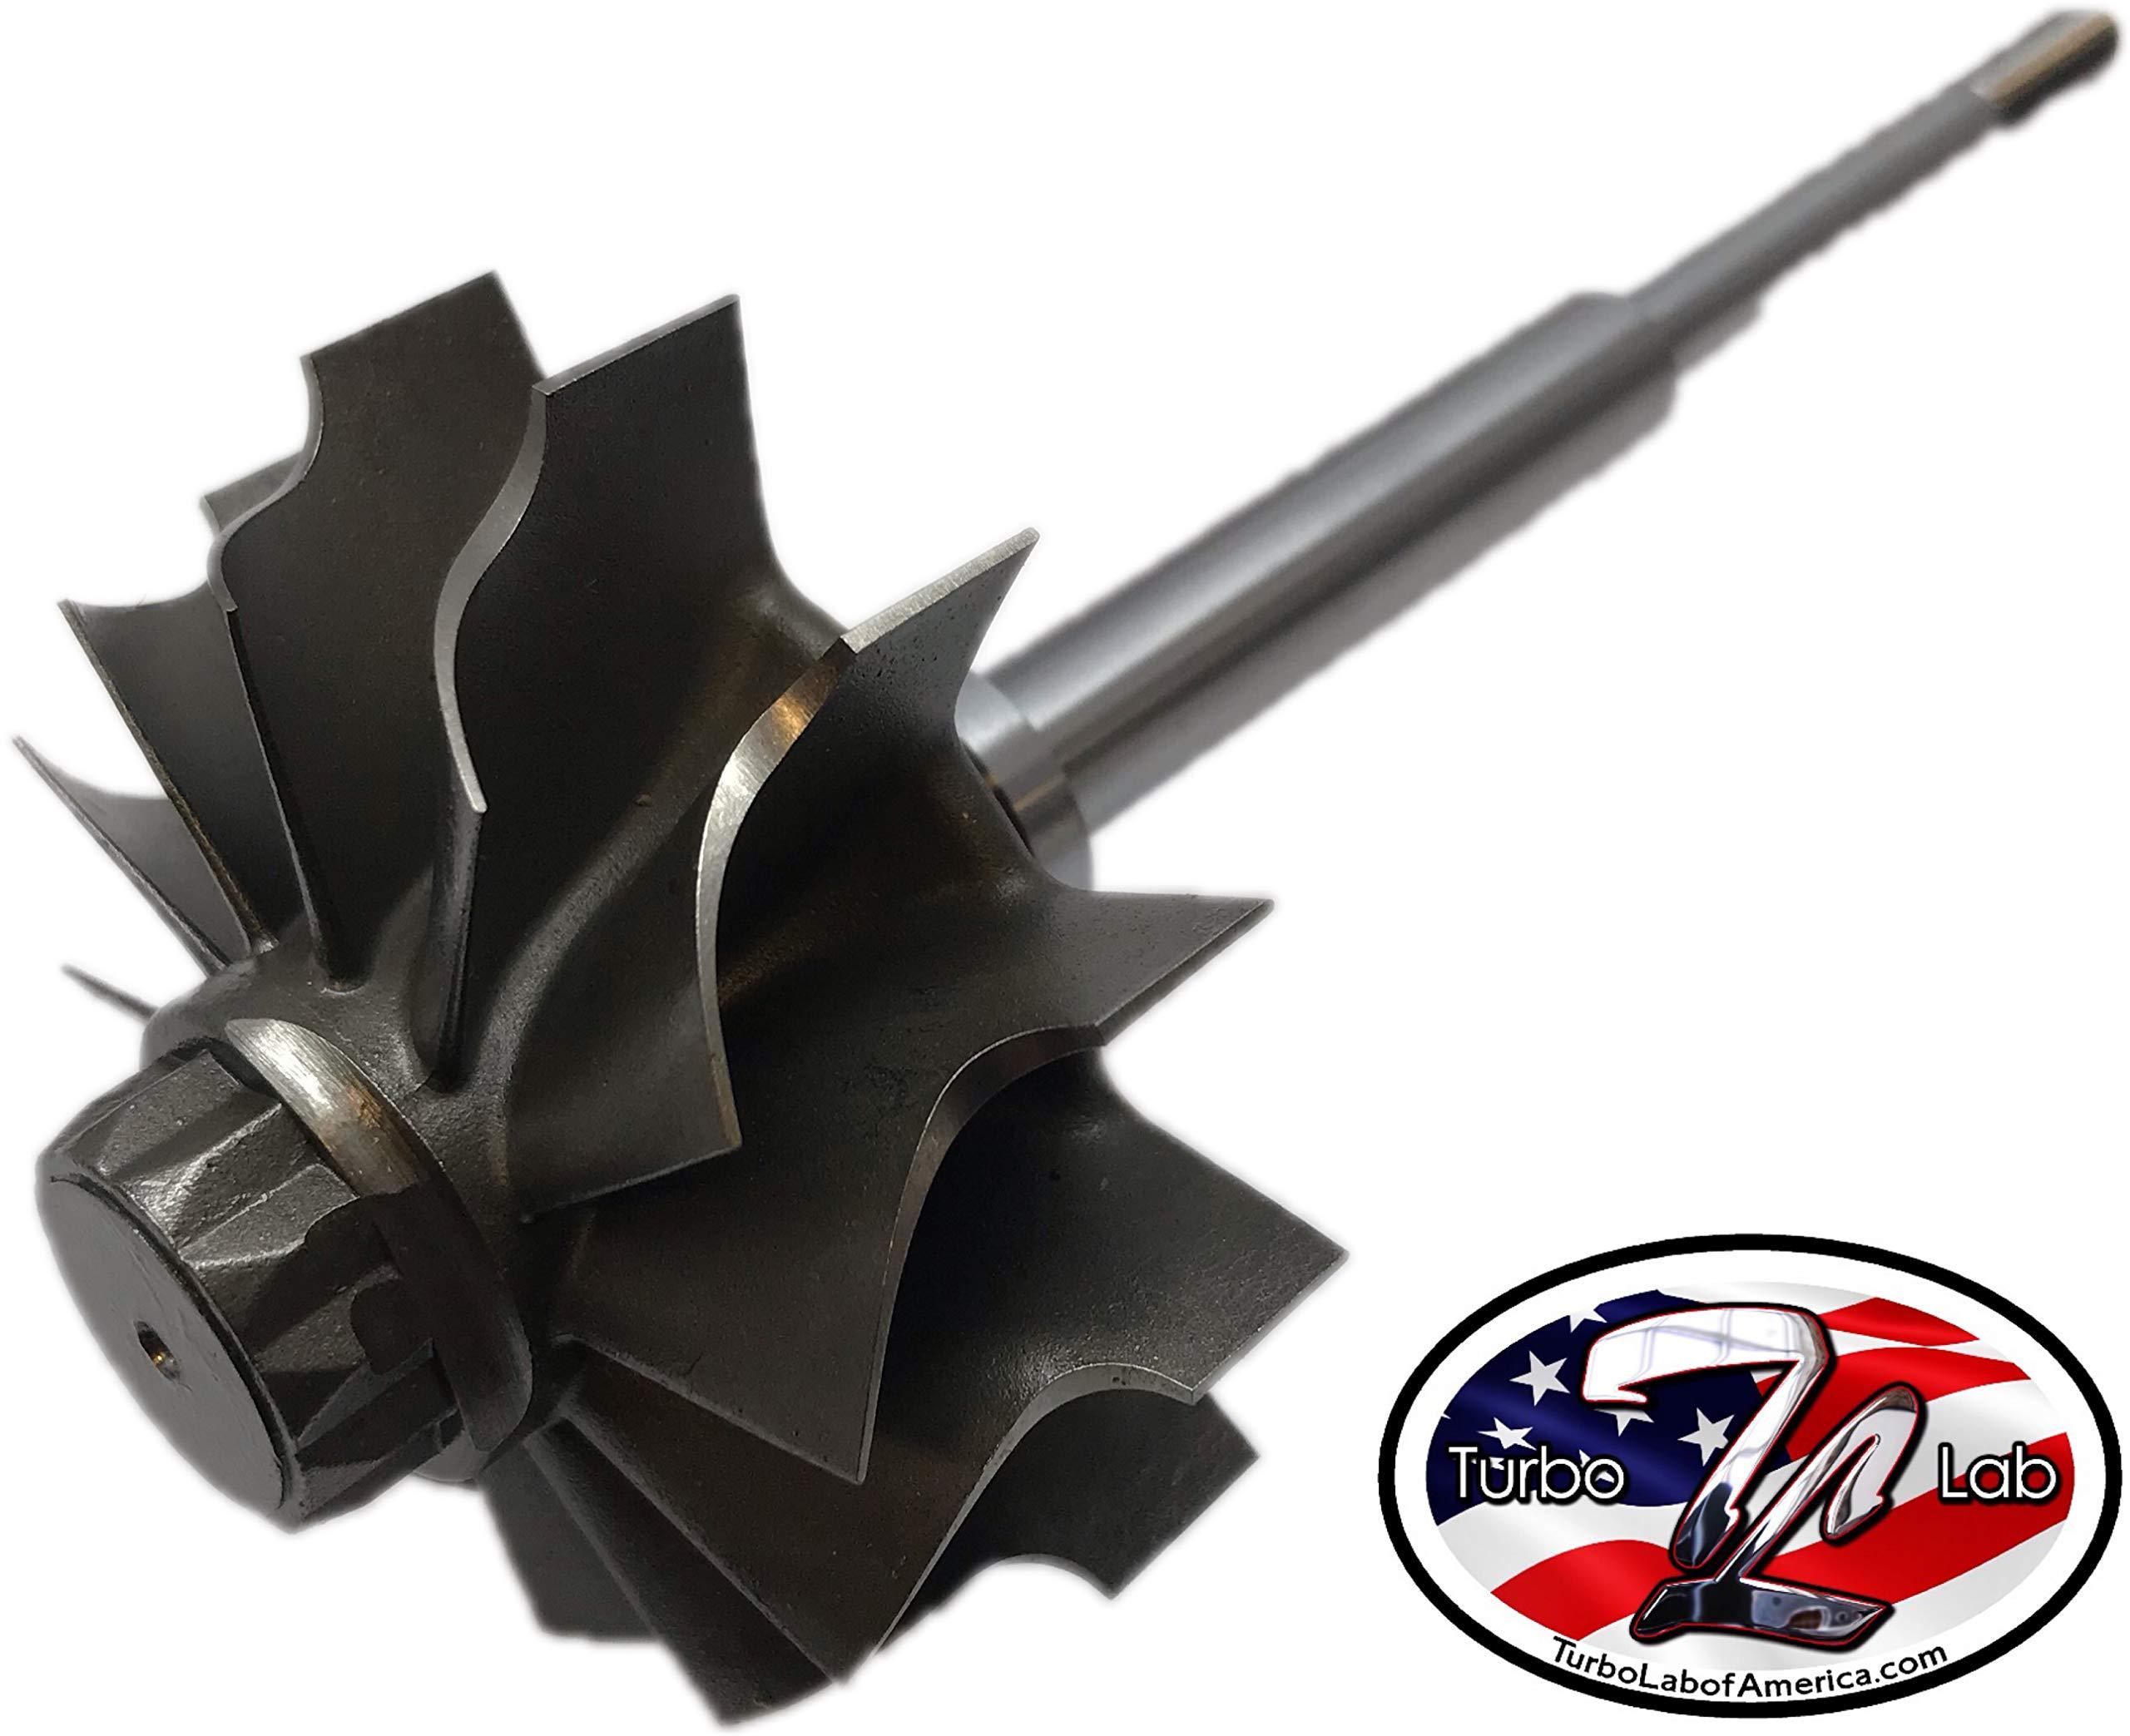 Turbo Lab America Holset HX35 H1C Turbine Wheel Shaft by Turbo Lab America